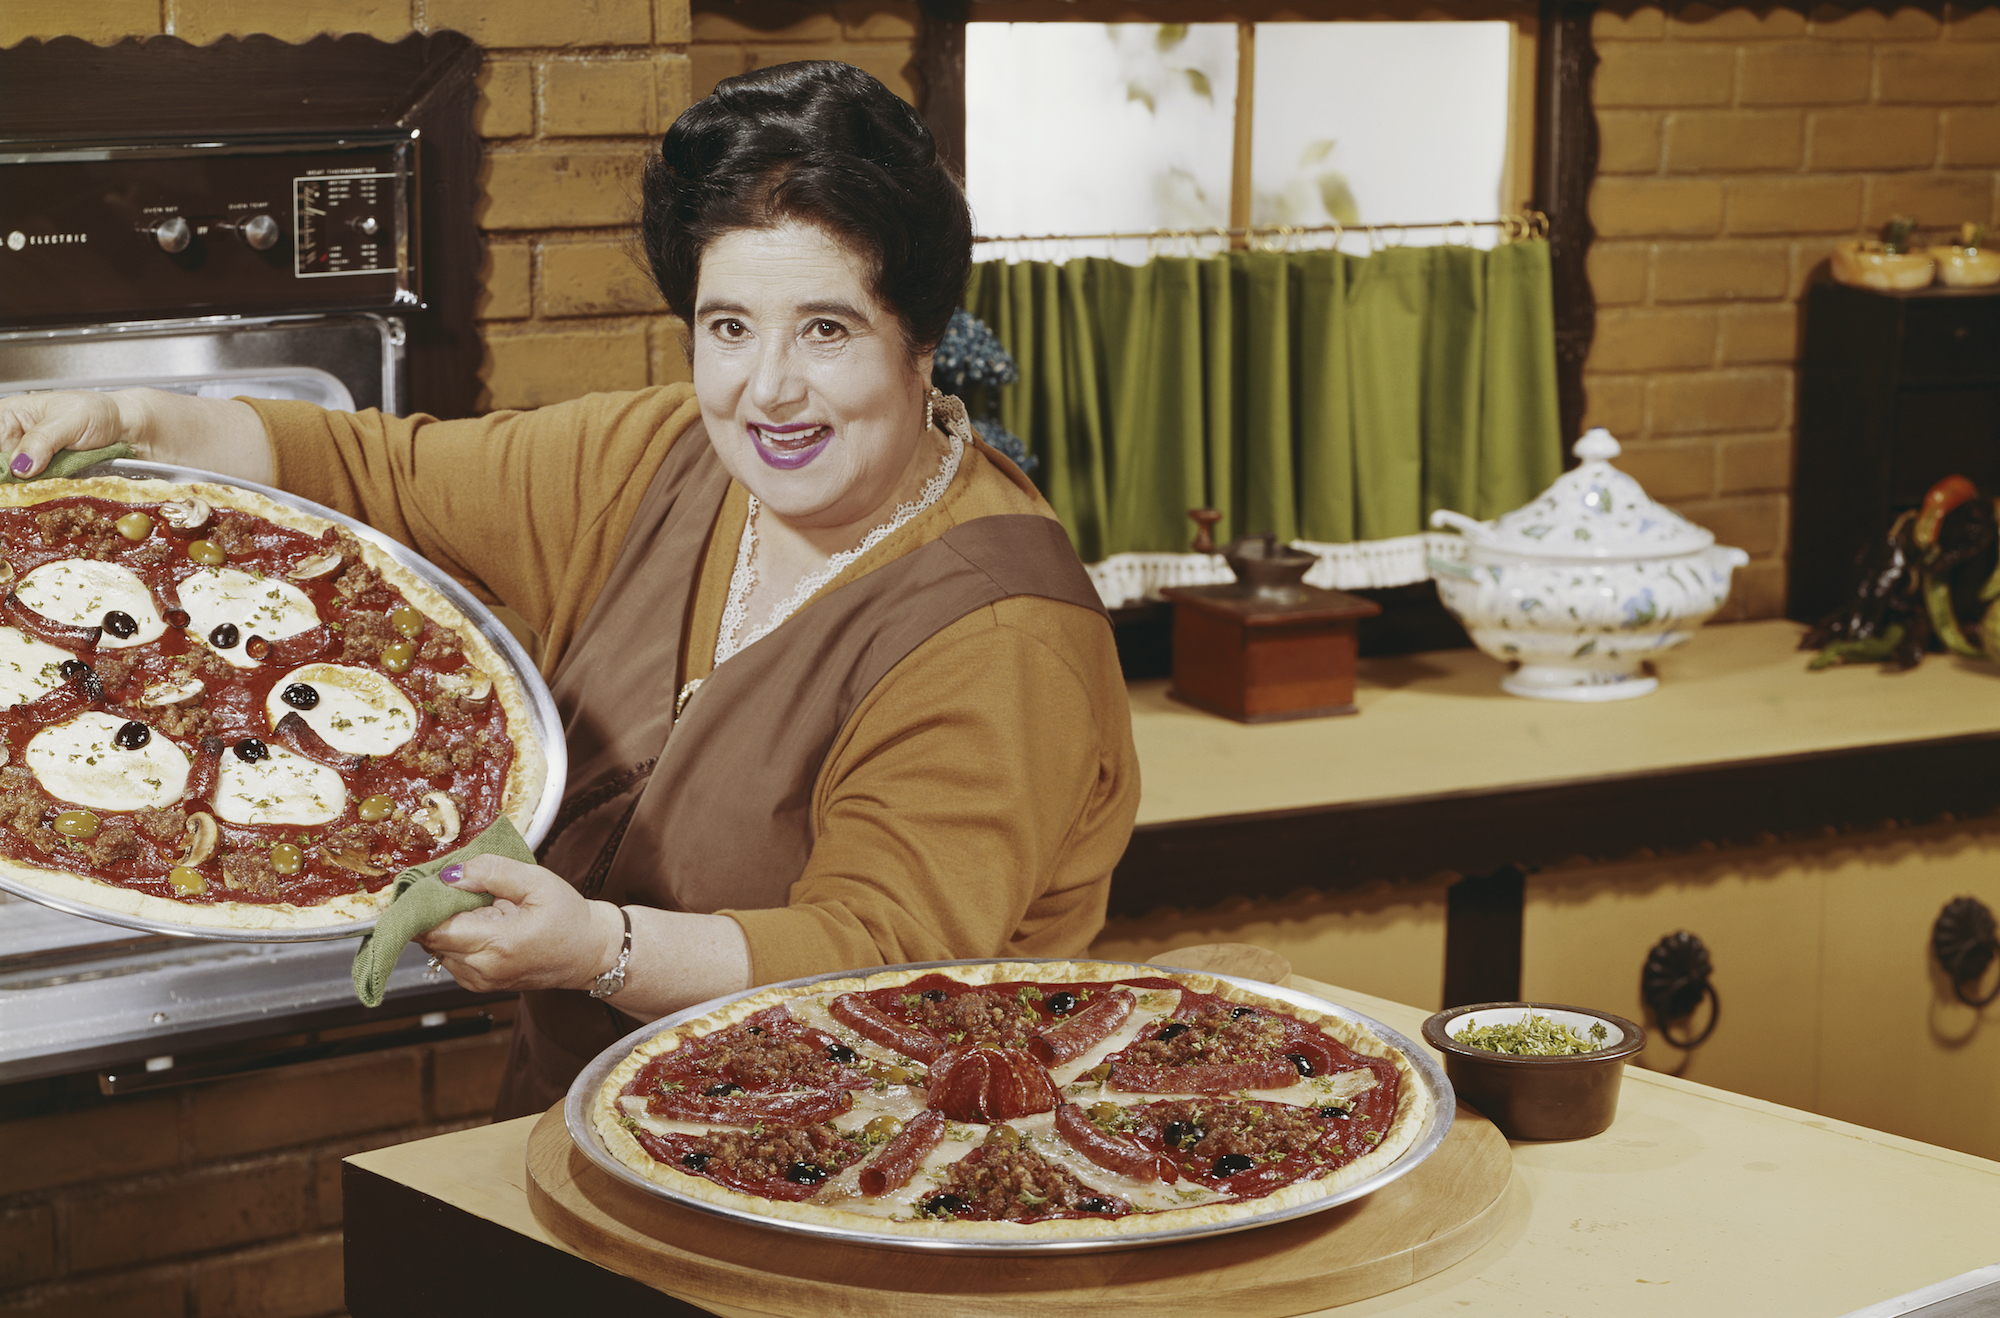 Woman preparing pizza in kitchen, portrait